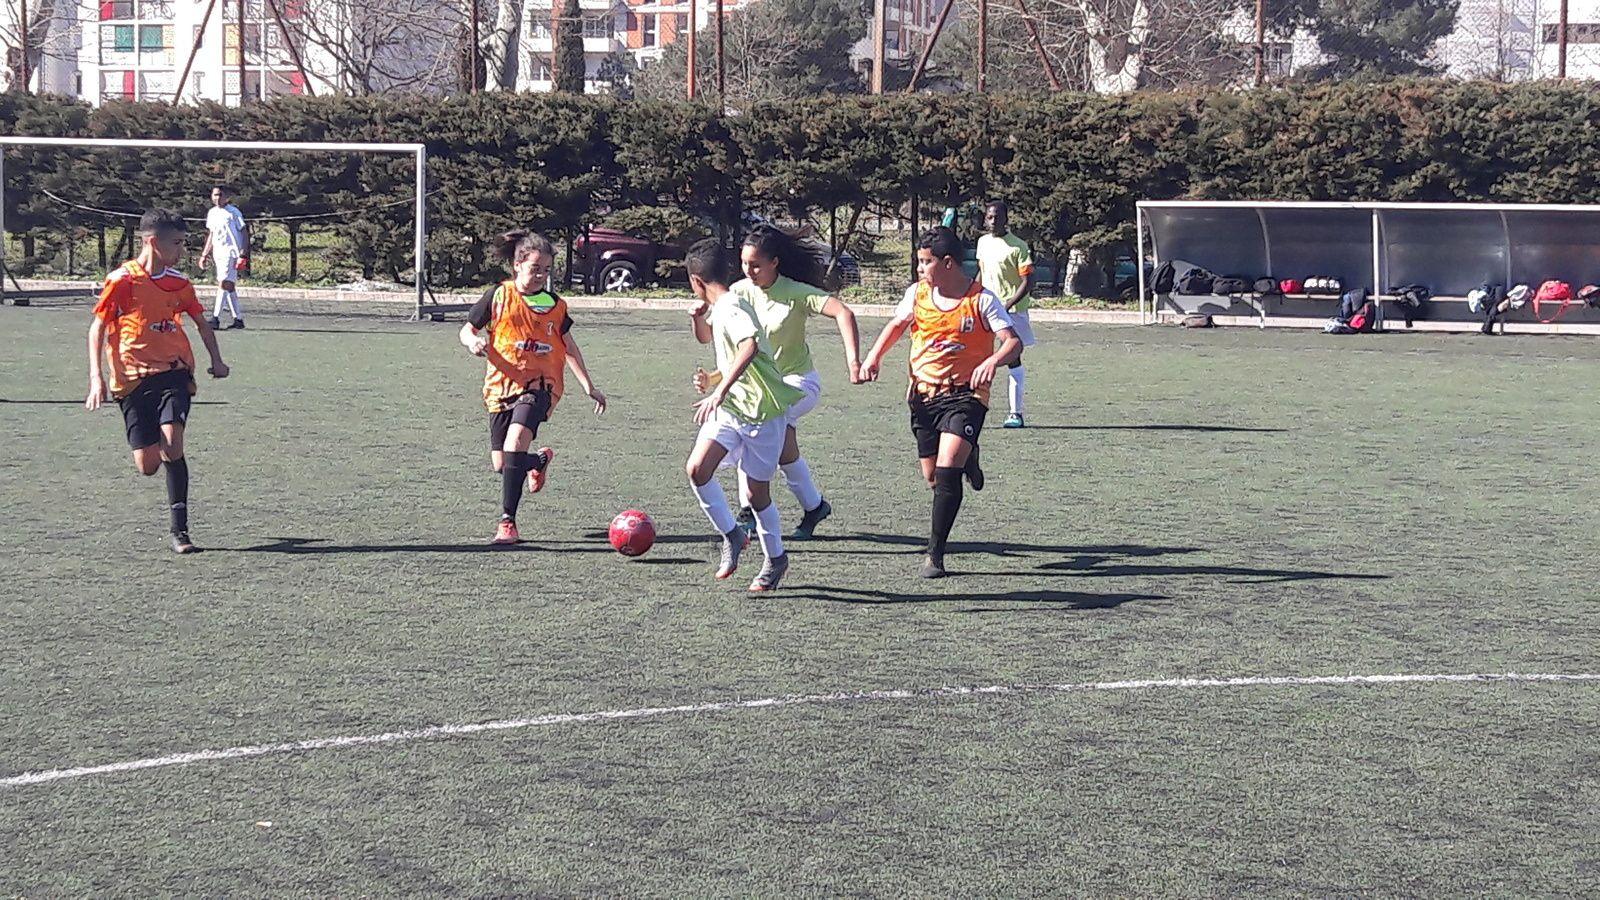 Tournoi de football mixte: Qualifiés !